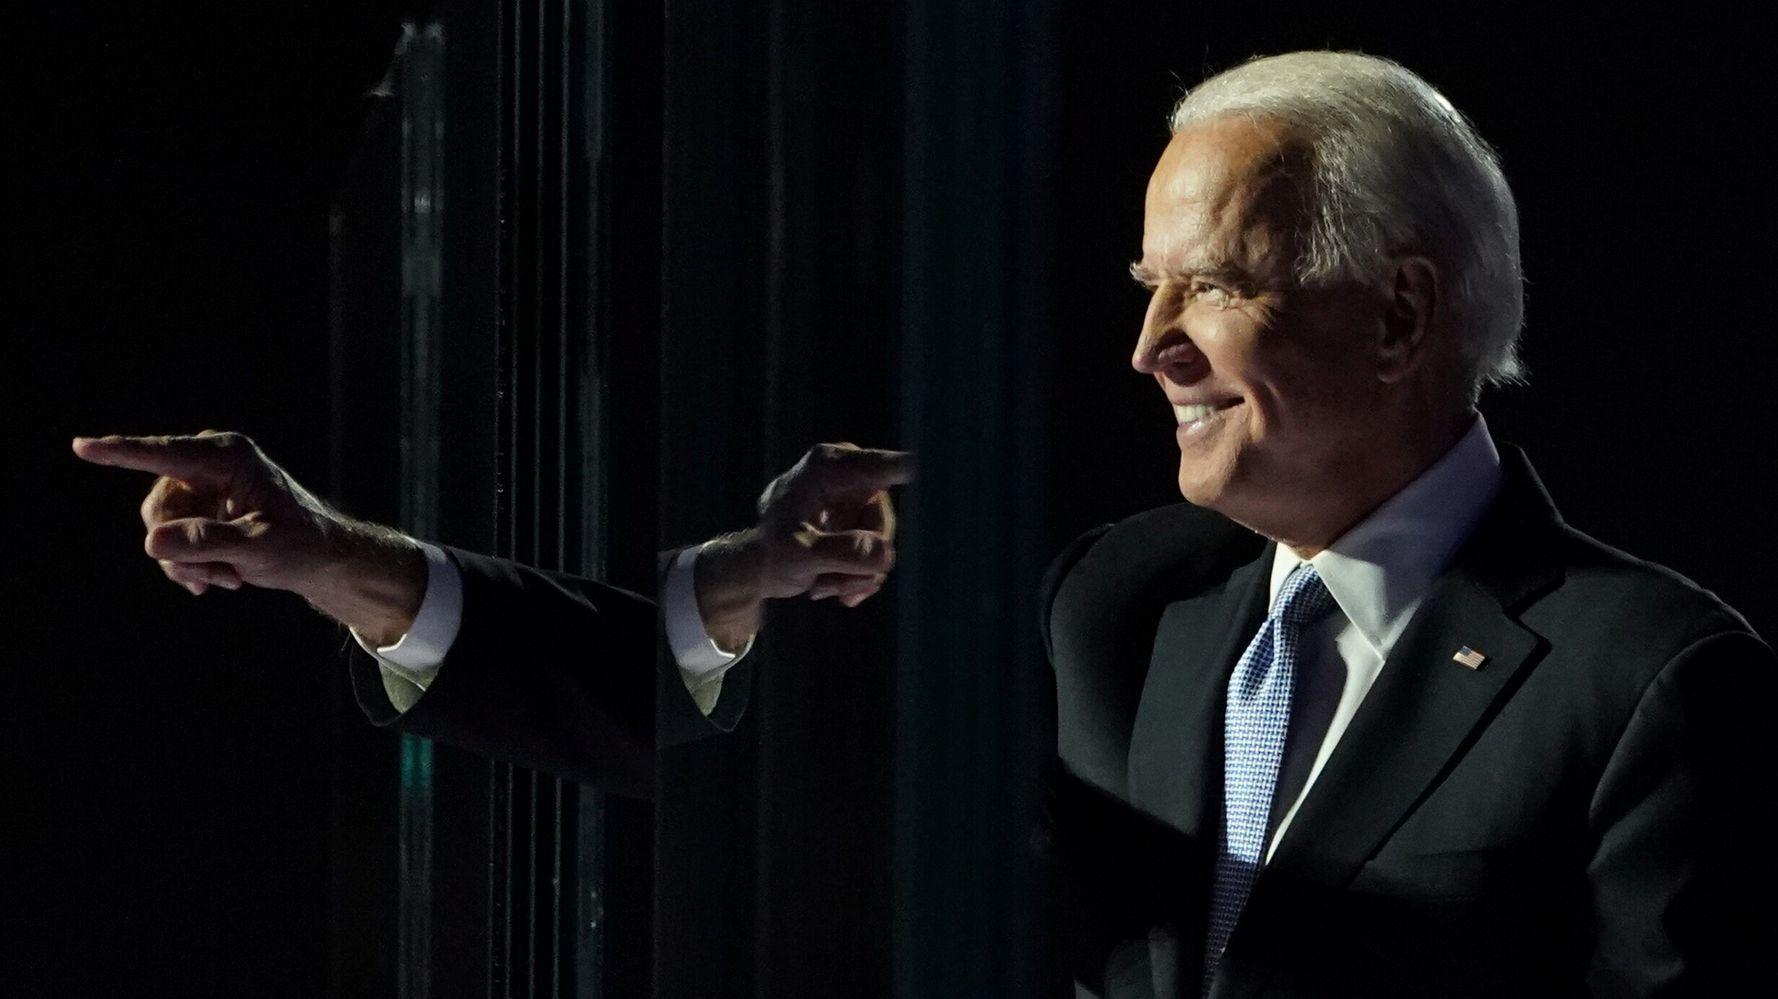 Activists Urge Joe Biden To Pull Out Of Saudi Arabia's Brutal War In Yemen